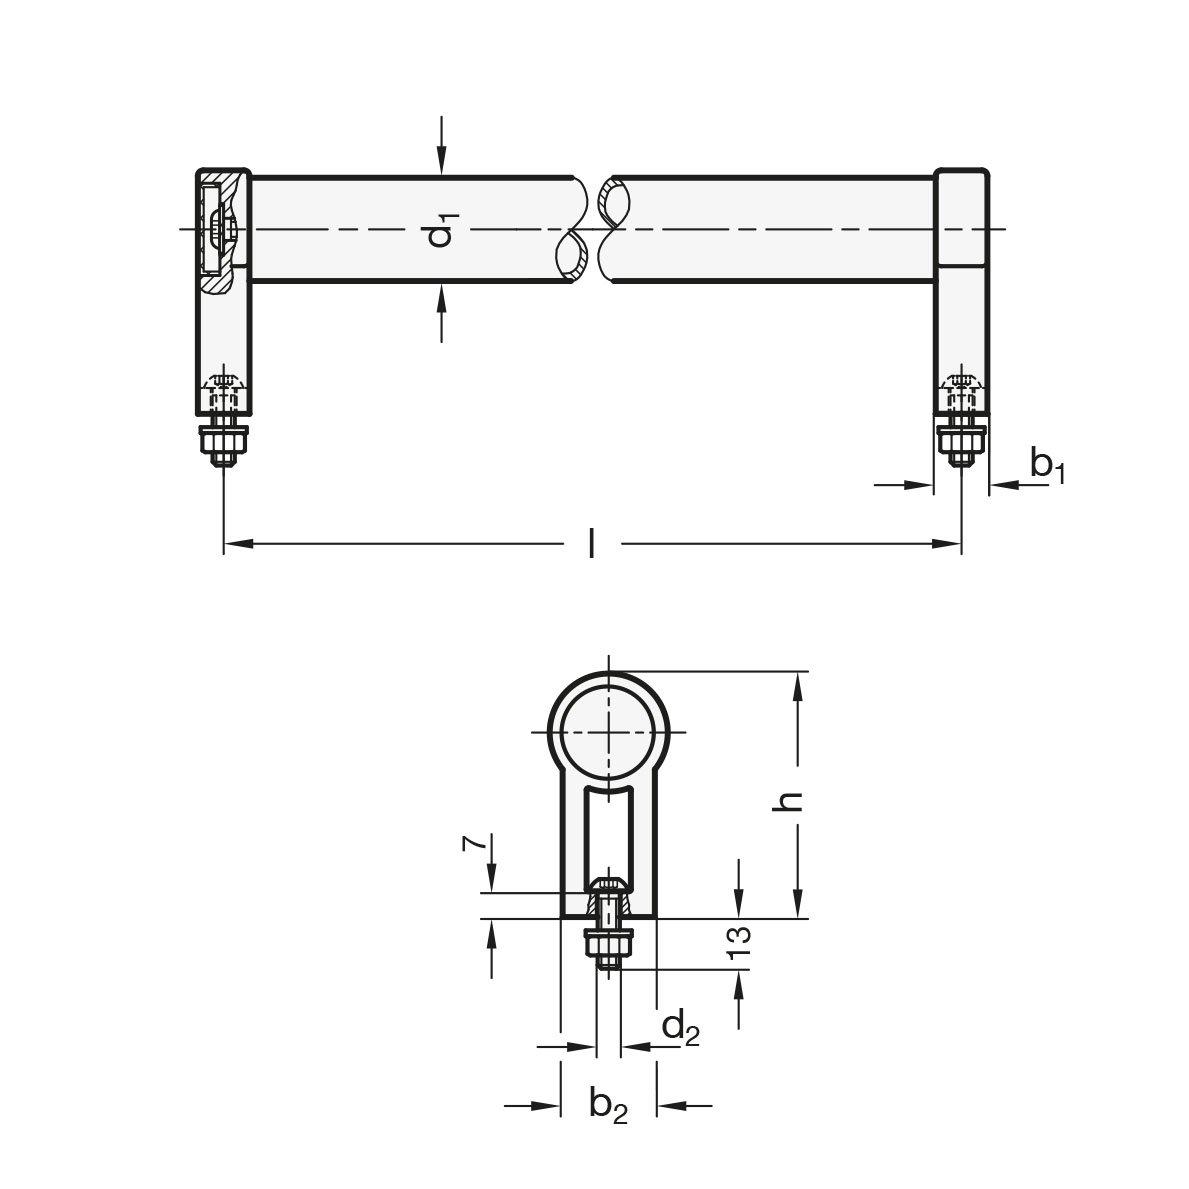 naturfarben Durchmesser: 28mm Rohrgriffe GN 333.1-28-600-B-EL Form B Ganter Normelemente eloxiert Aluminium 1 St/ück